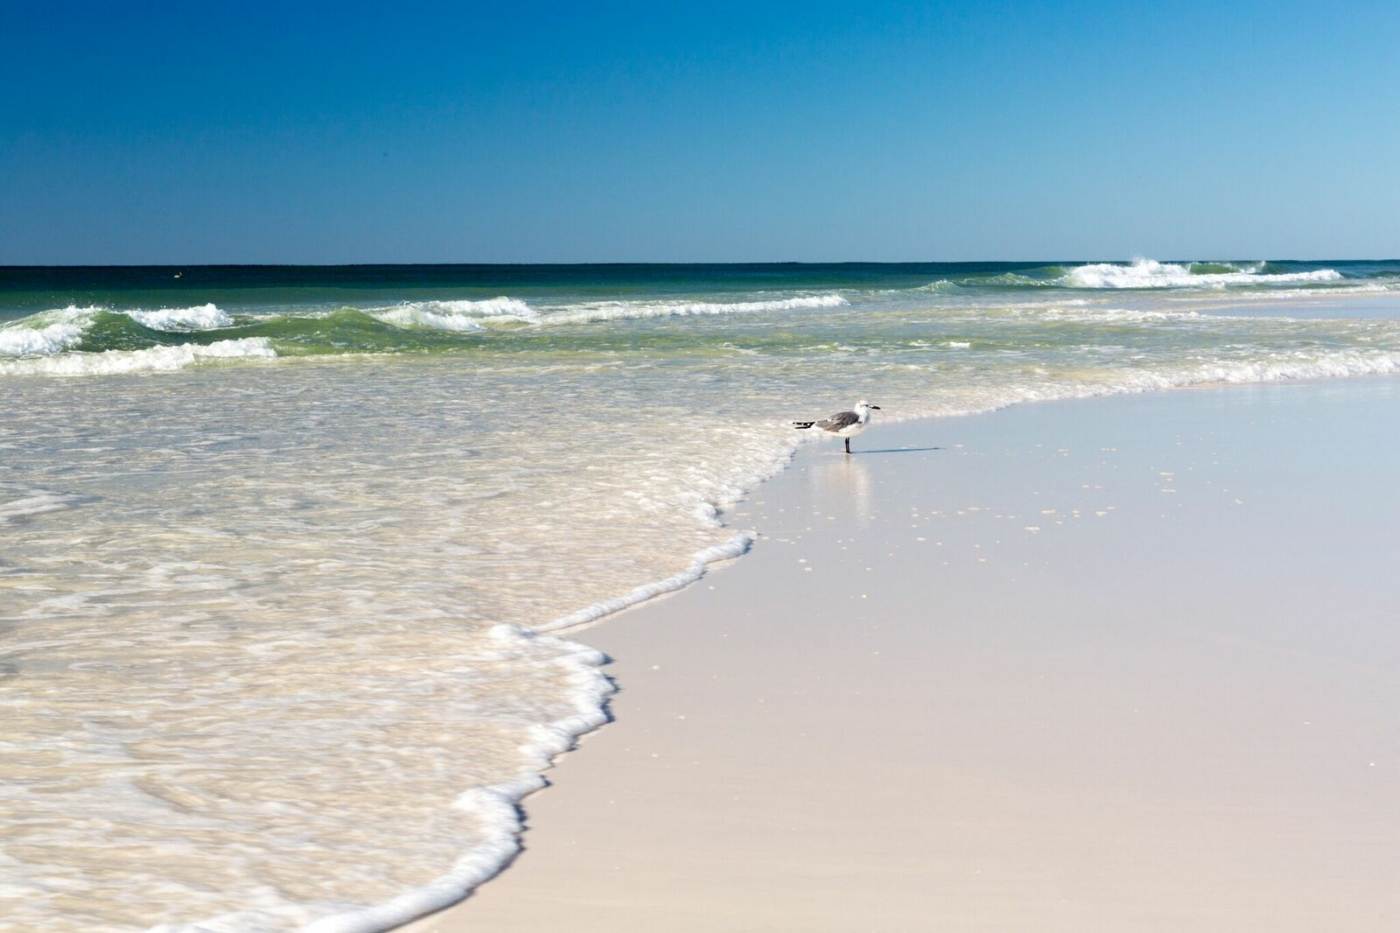 Image of shoreline of South Walton beach.